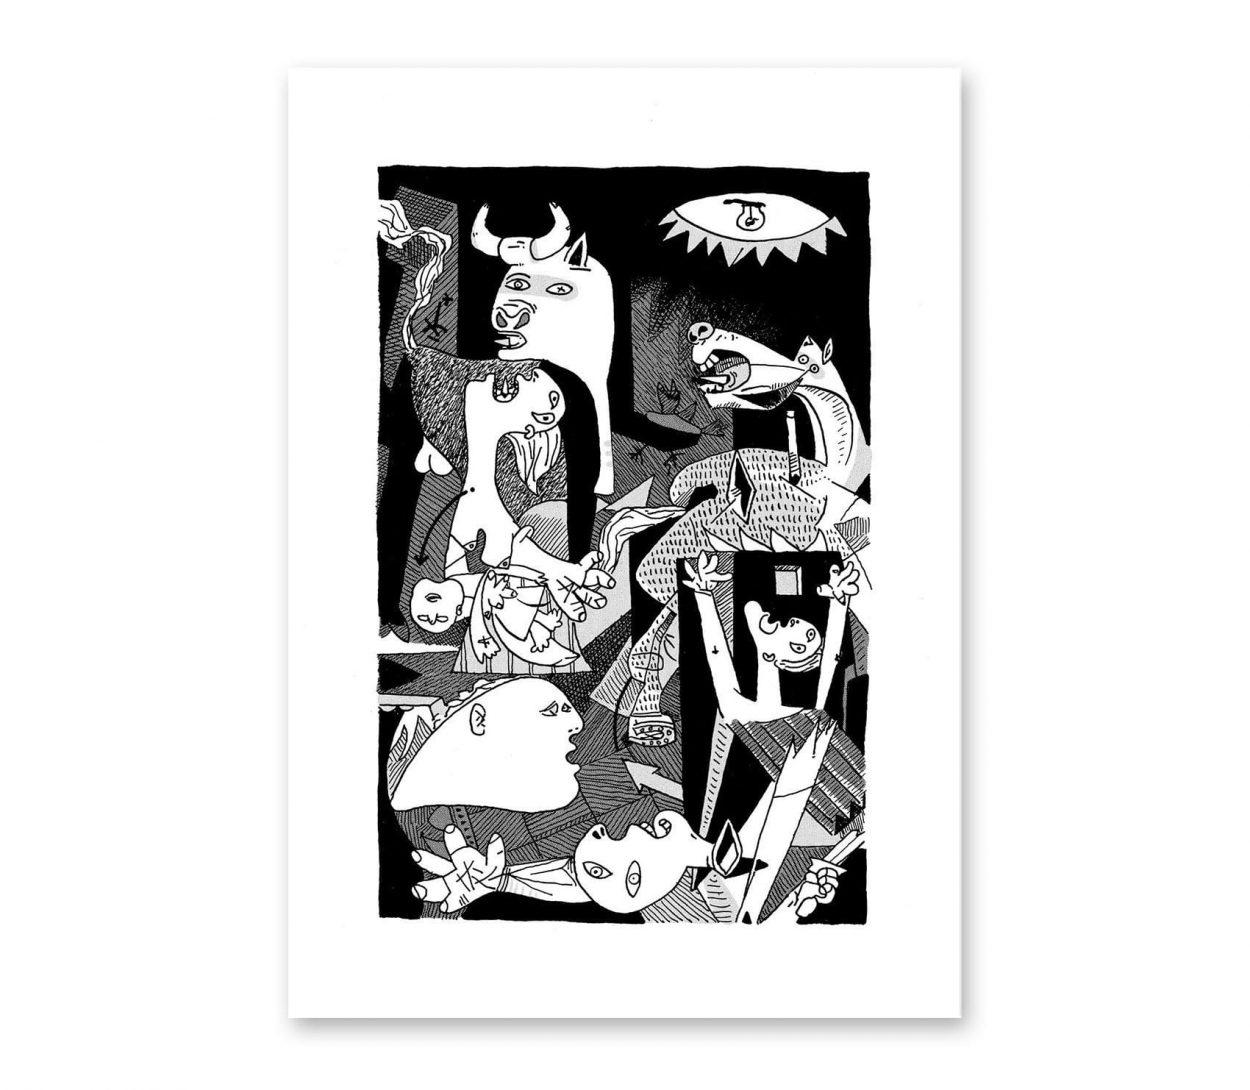 Lámina impresión digital Guernica de Pablo Picasso. Arte cubista, abstracto. Ilustración